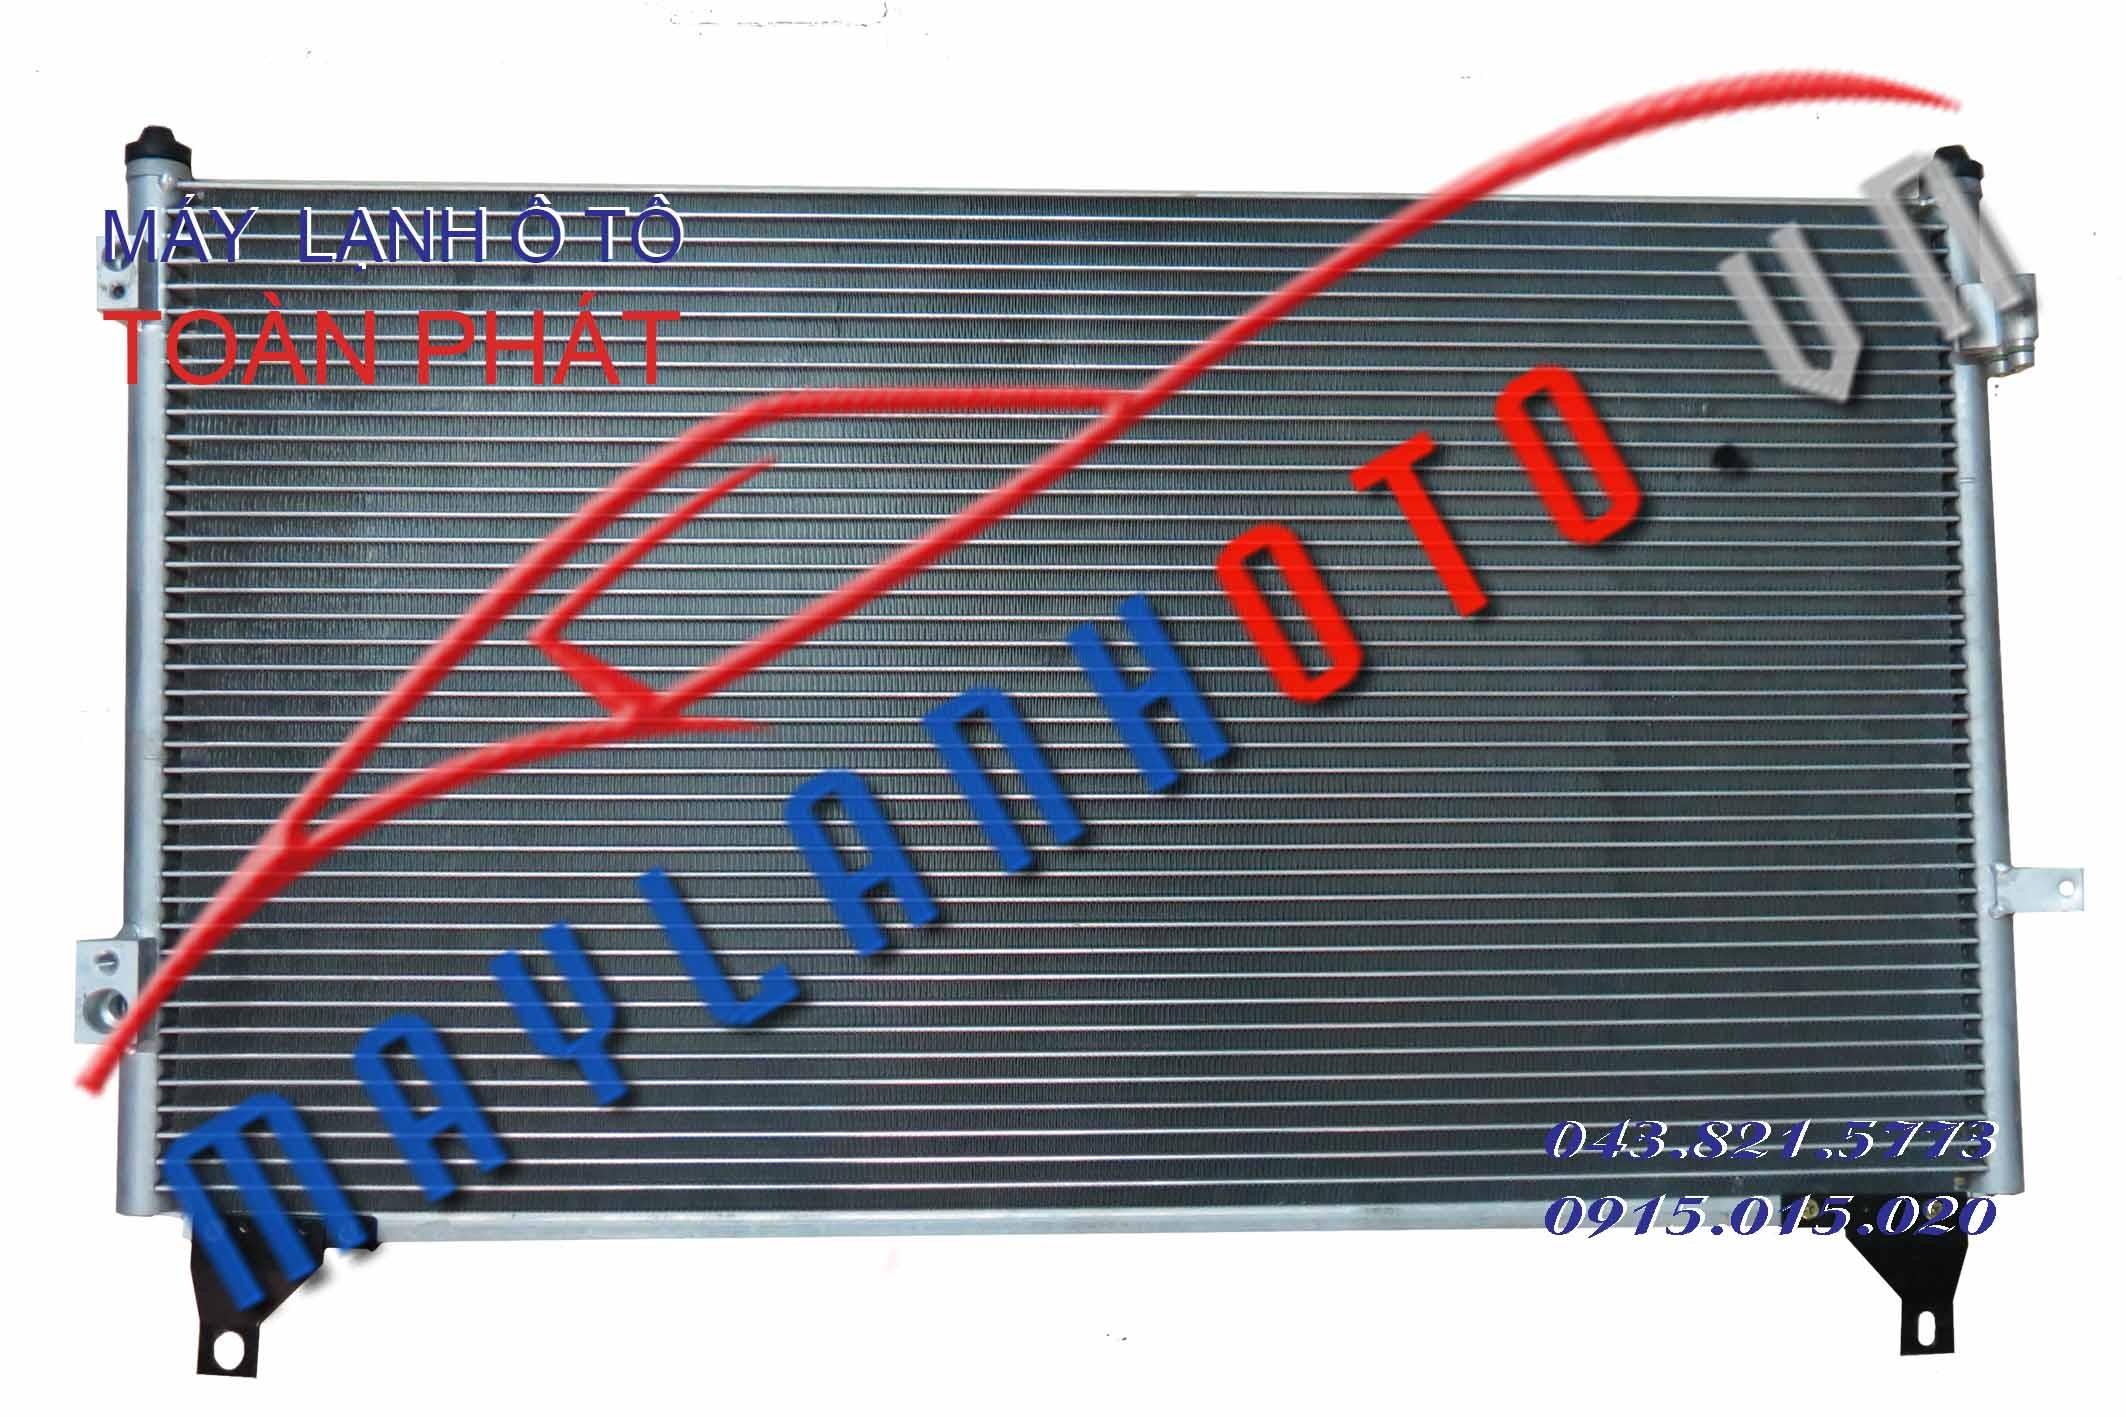 Zinger / Giàn nóng điều hòa Mitsubishi Zinger